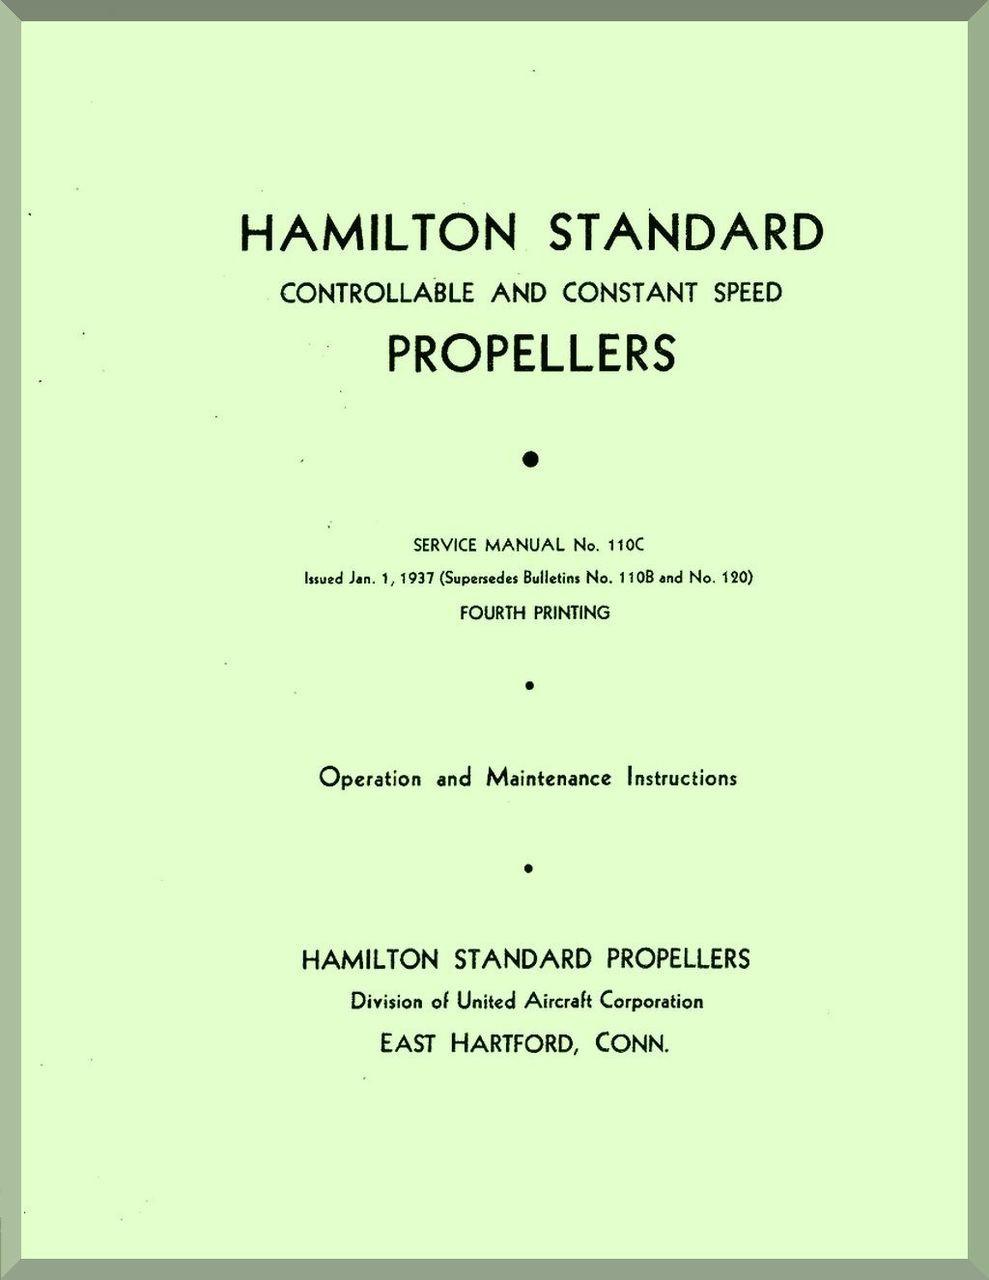 Hamilton Standard Constant Speed Aircraft Propeller Service Manual - 110C.  Price: $14.85. Image 1